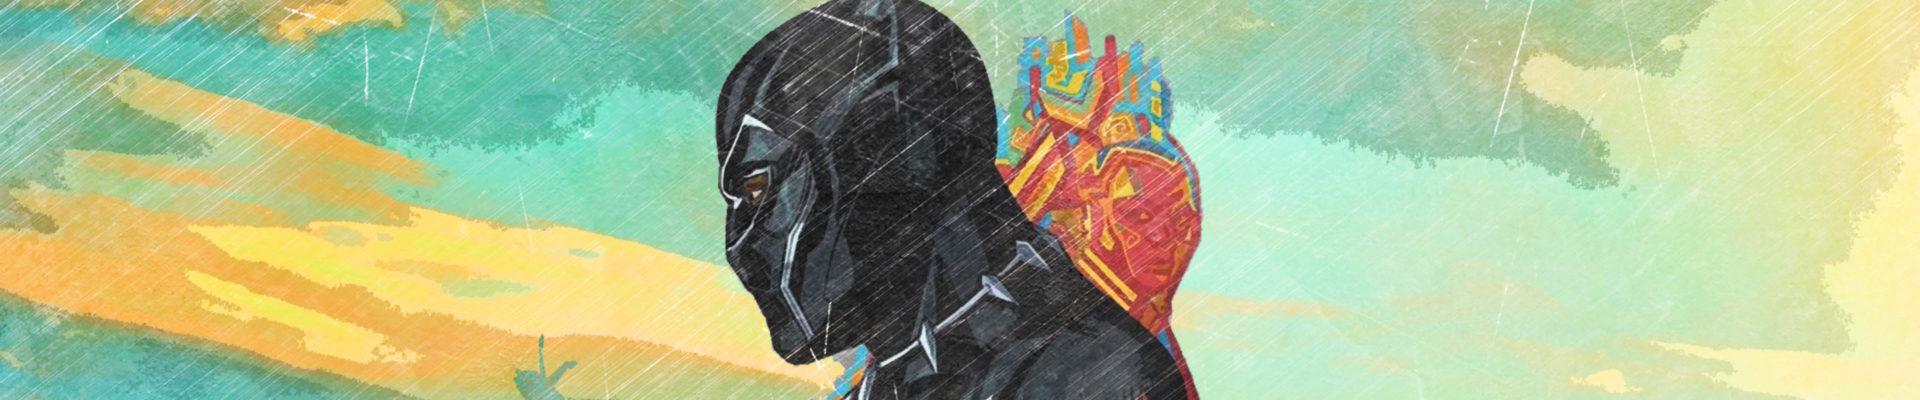 Black Panther promo art, by markfresch, via hdqwalls.com